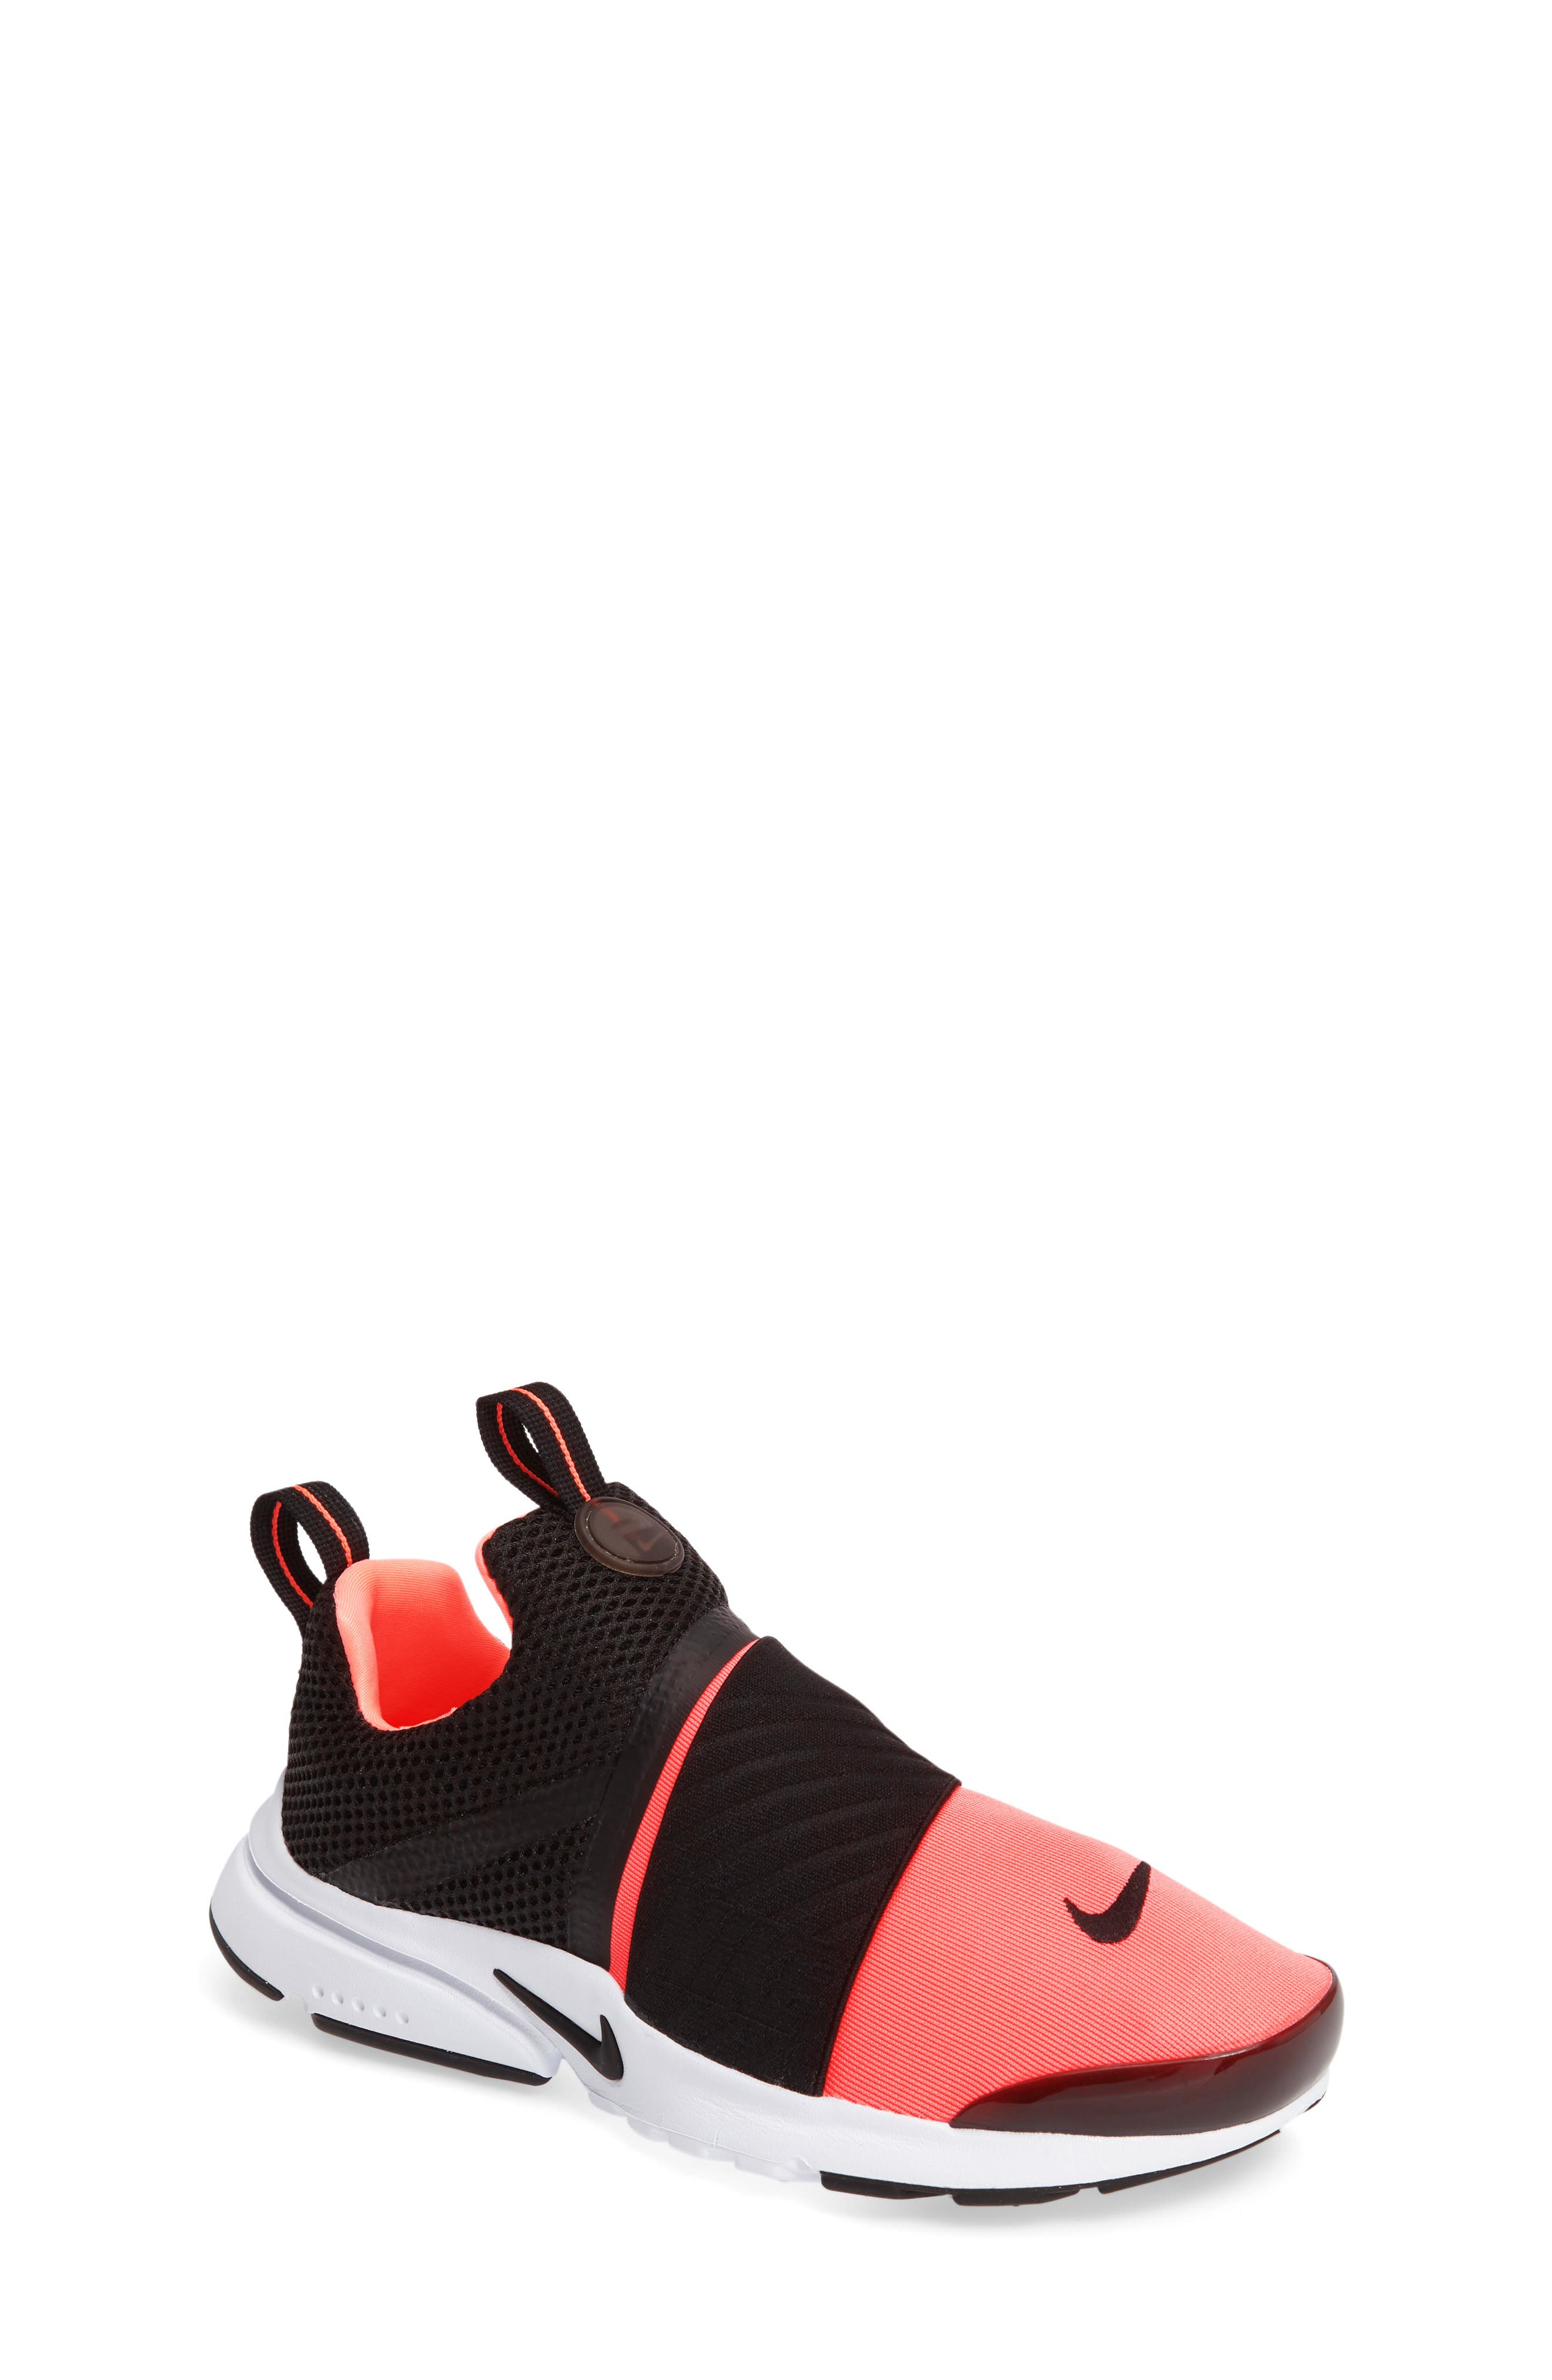 Presto Extreme Sneaker,                             Main thumbnail 3, color,